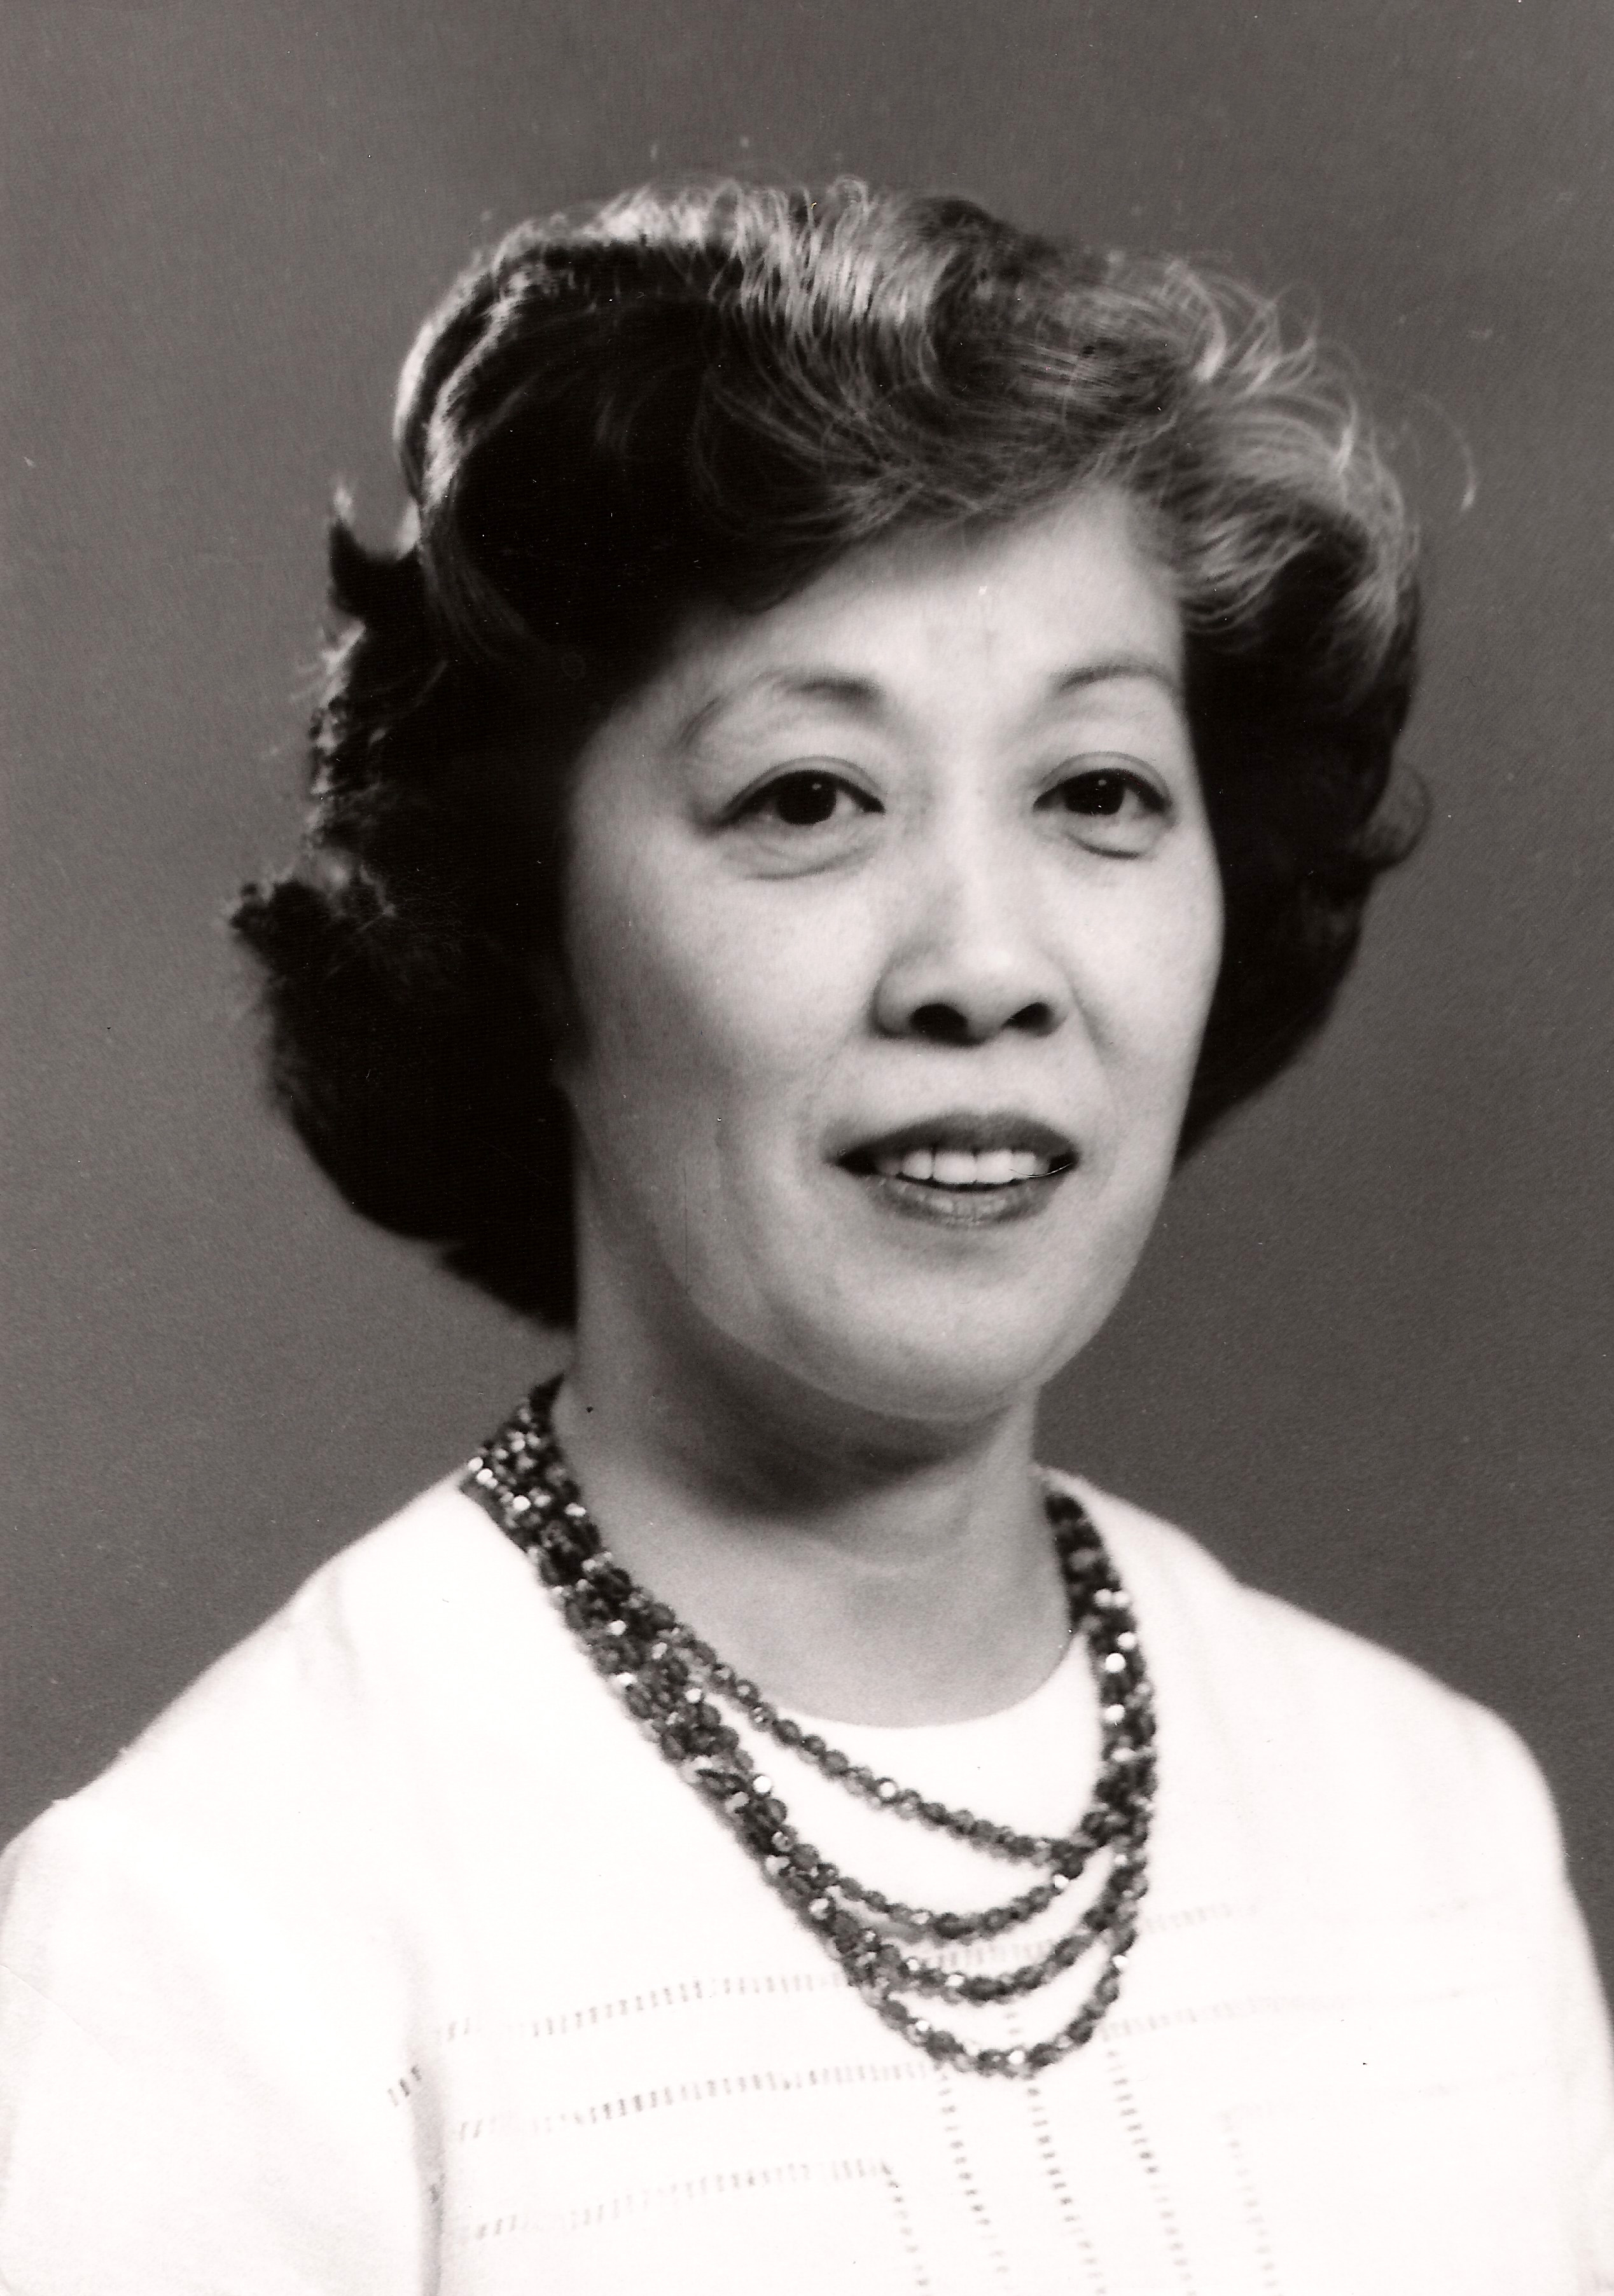 Photographic portrait of Irene Uchida